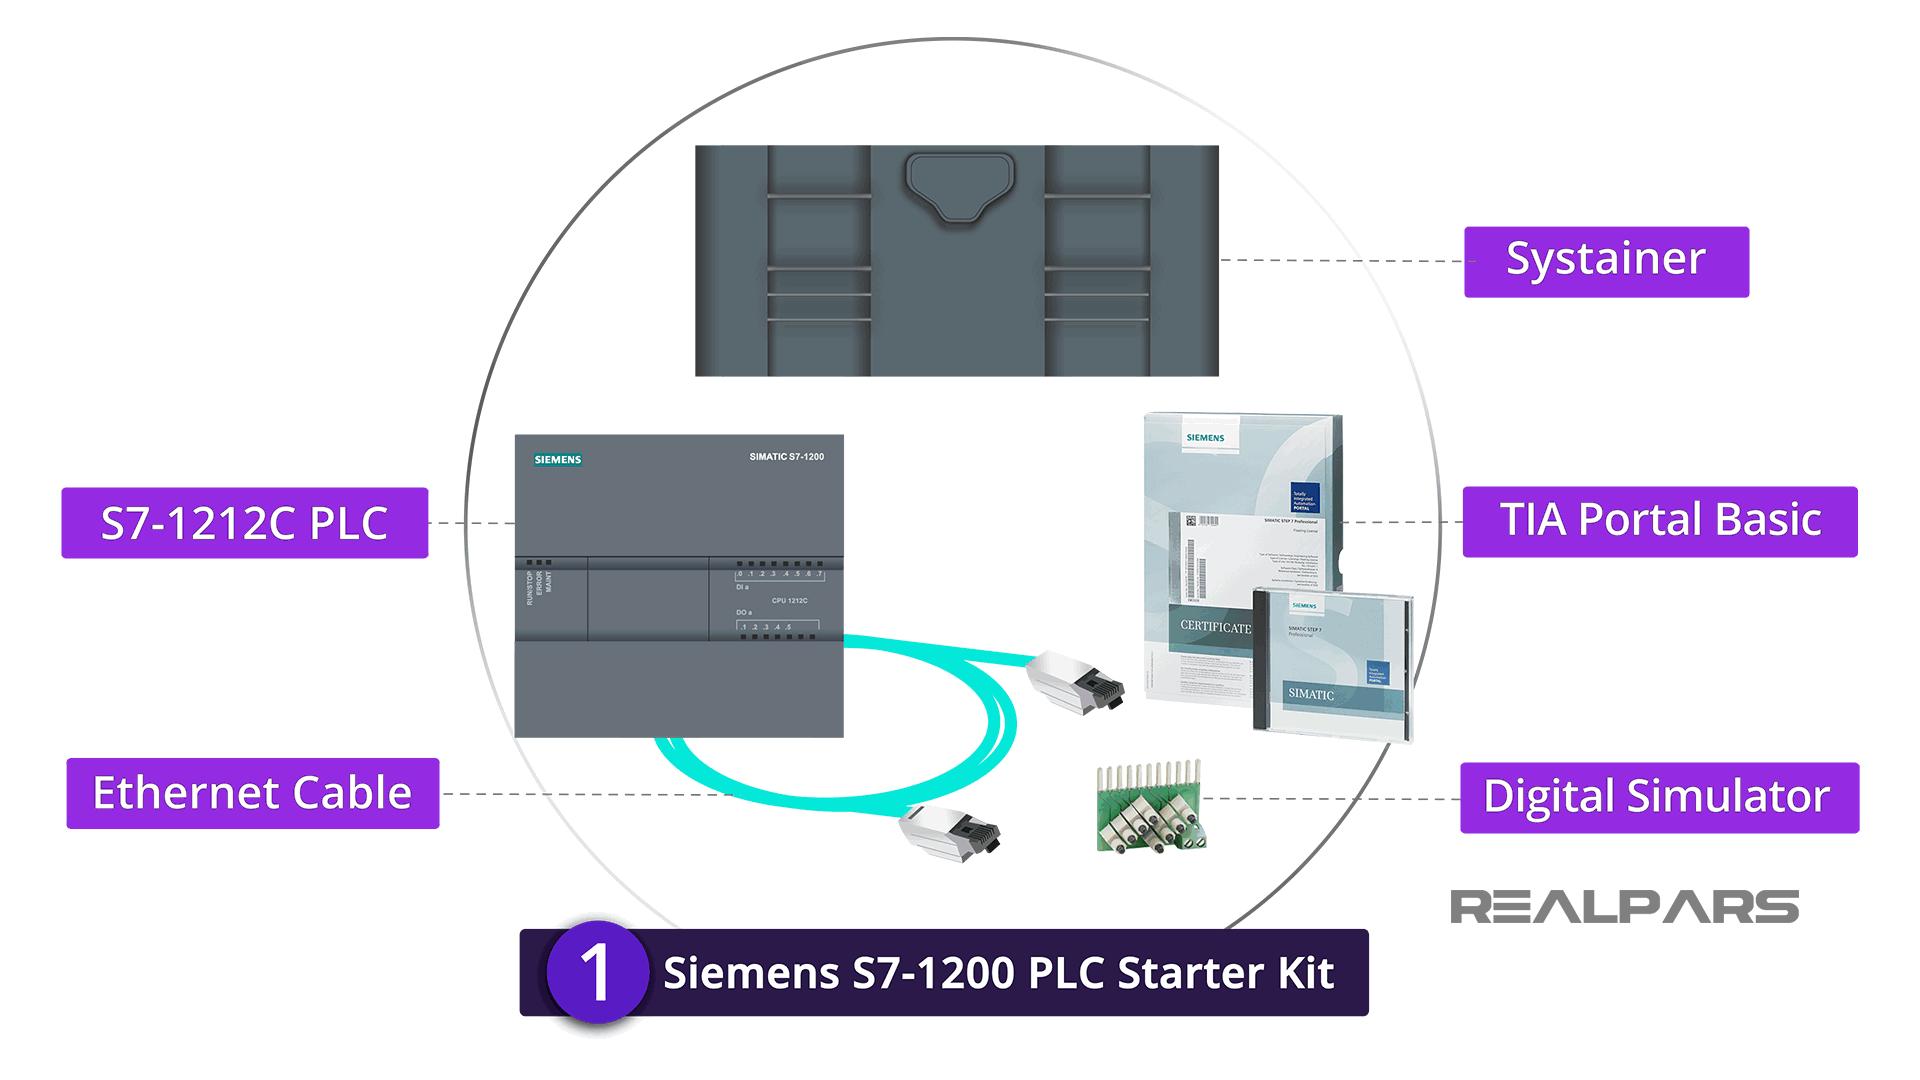 Siemens S7-1200 PLC starter kits Accessories